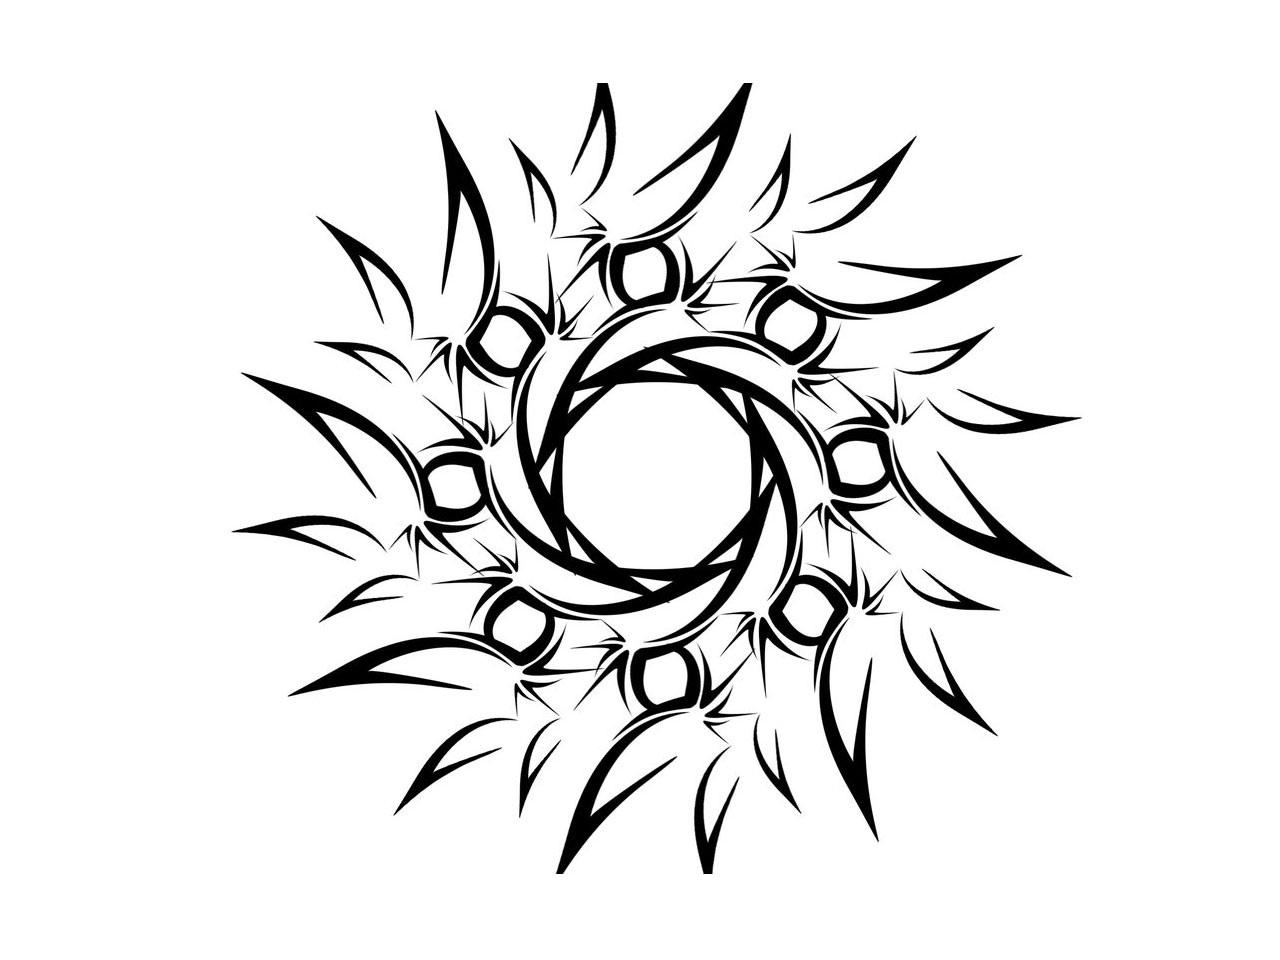 1280x960 Mesmerizing Cool Drawing Design Ideas Photos